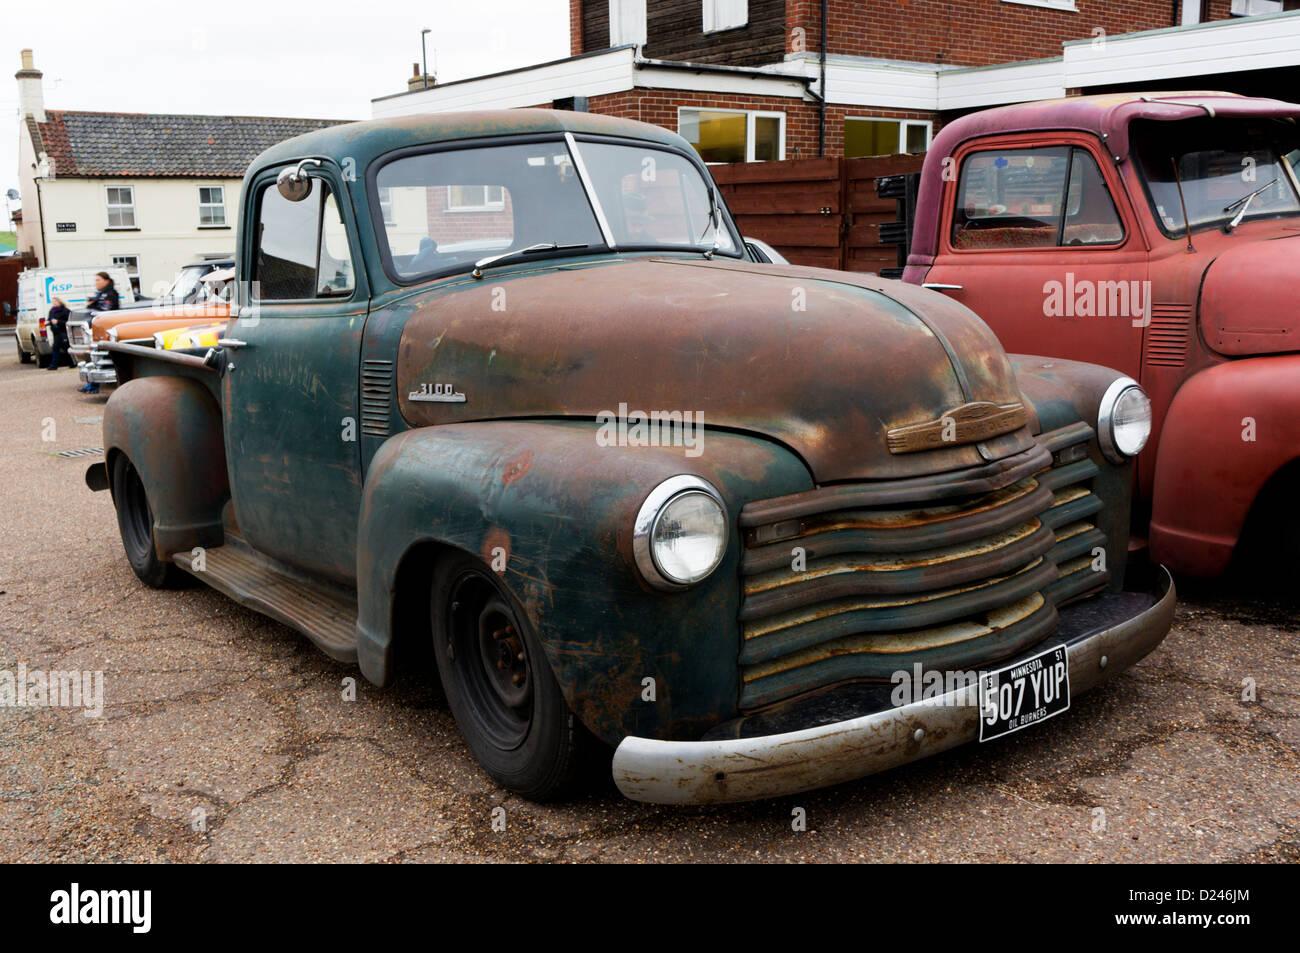 Old Chevrolet Pickup Truck In Stock Photos & Old Chevrolet Pickup ...